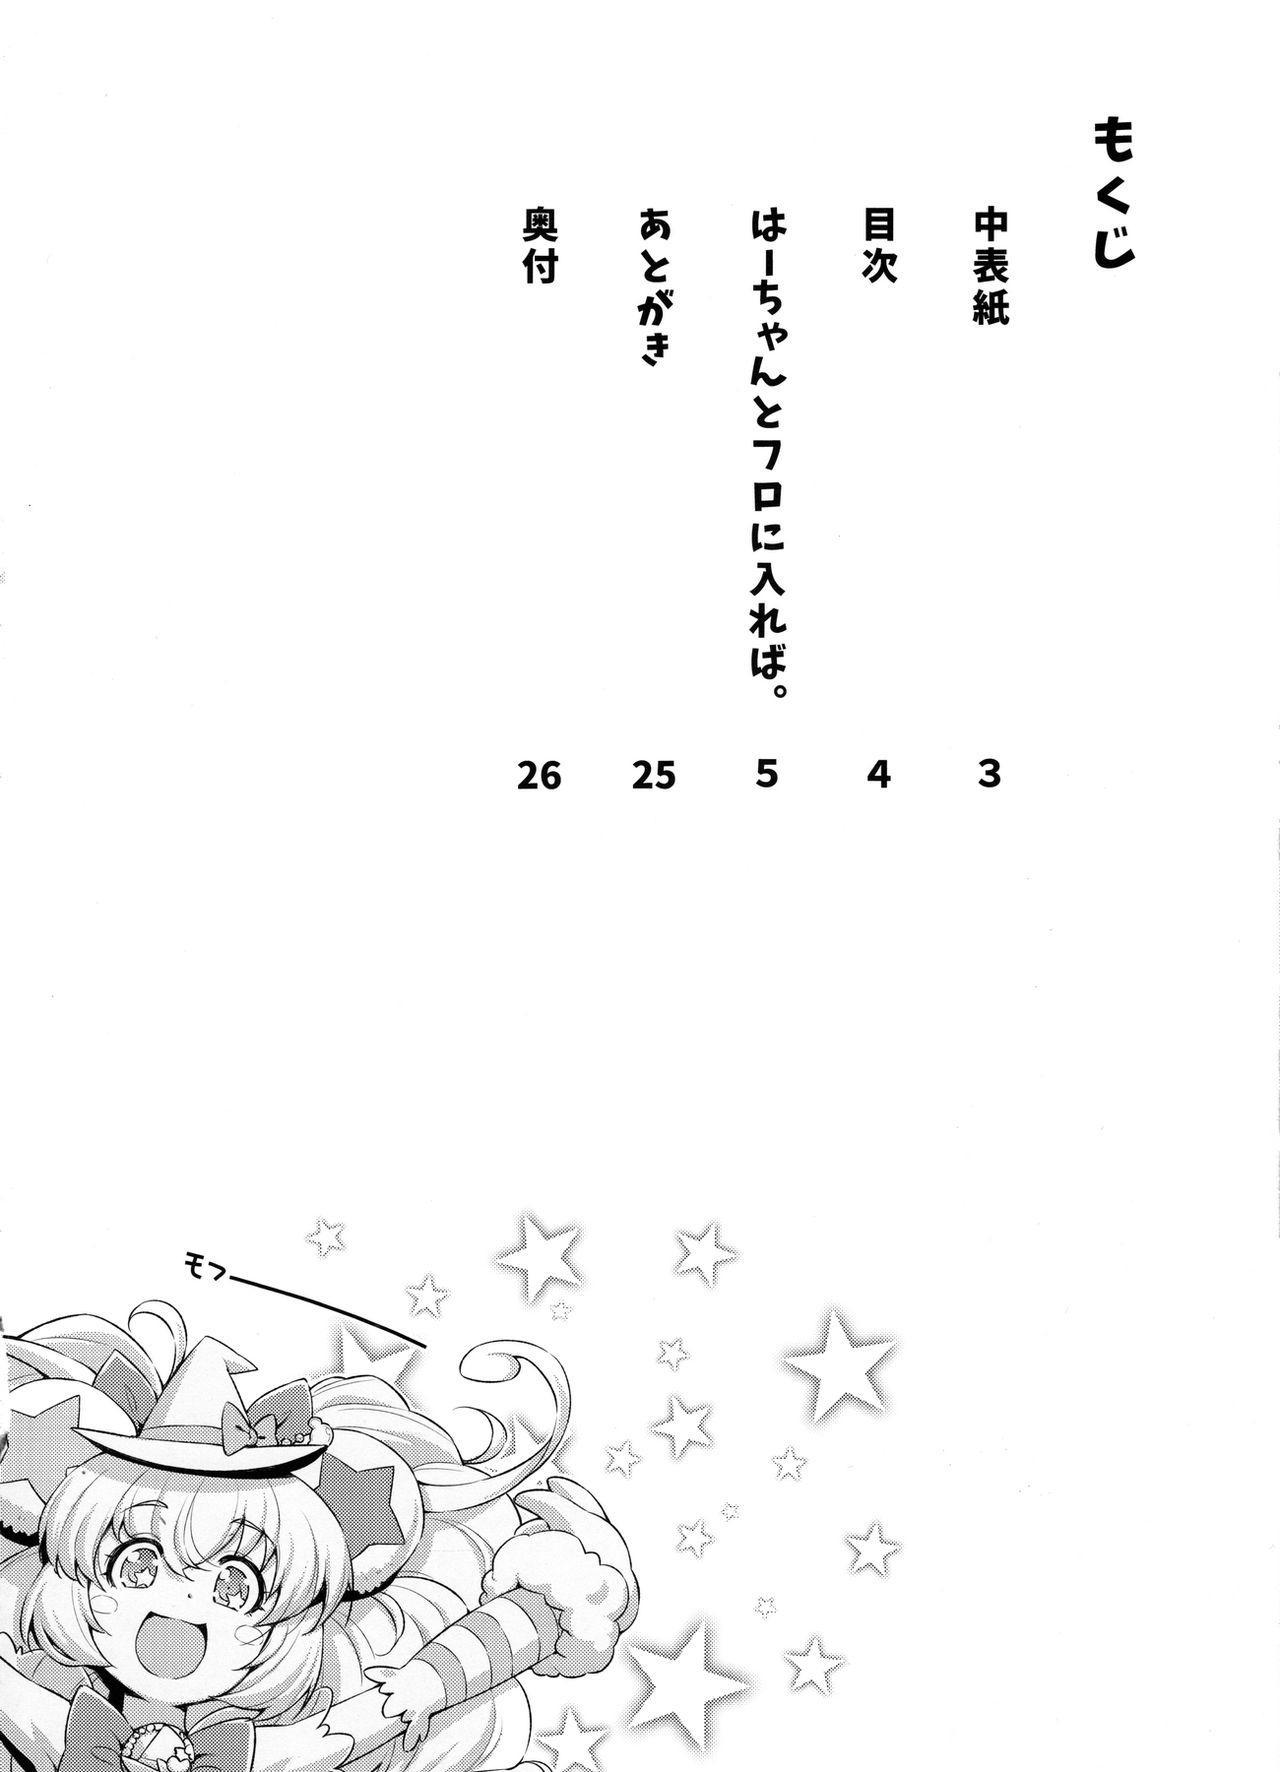 (C91) [ACID EATERS (Kazuma Muramasa)] Haa-chan to Furo ni Haireba. (Mahou Tsukai Precure!)(Chinese) 3